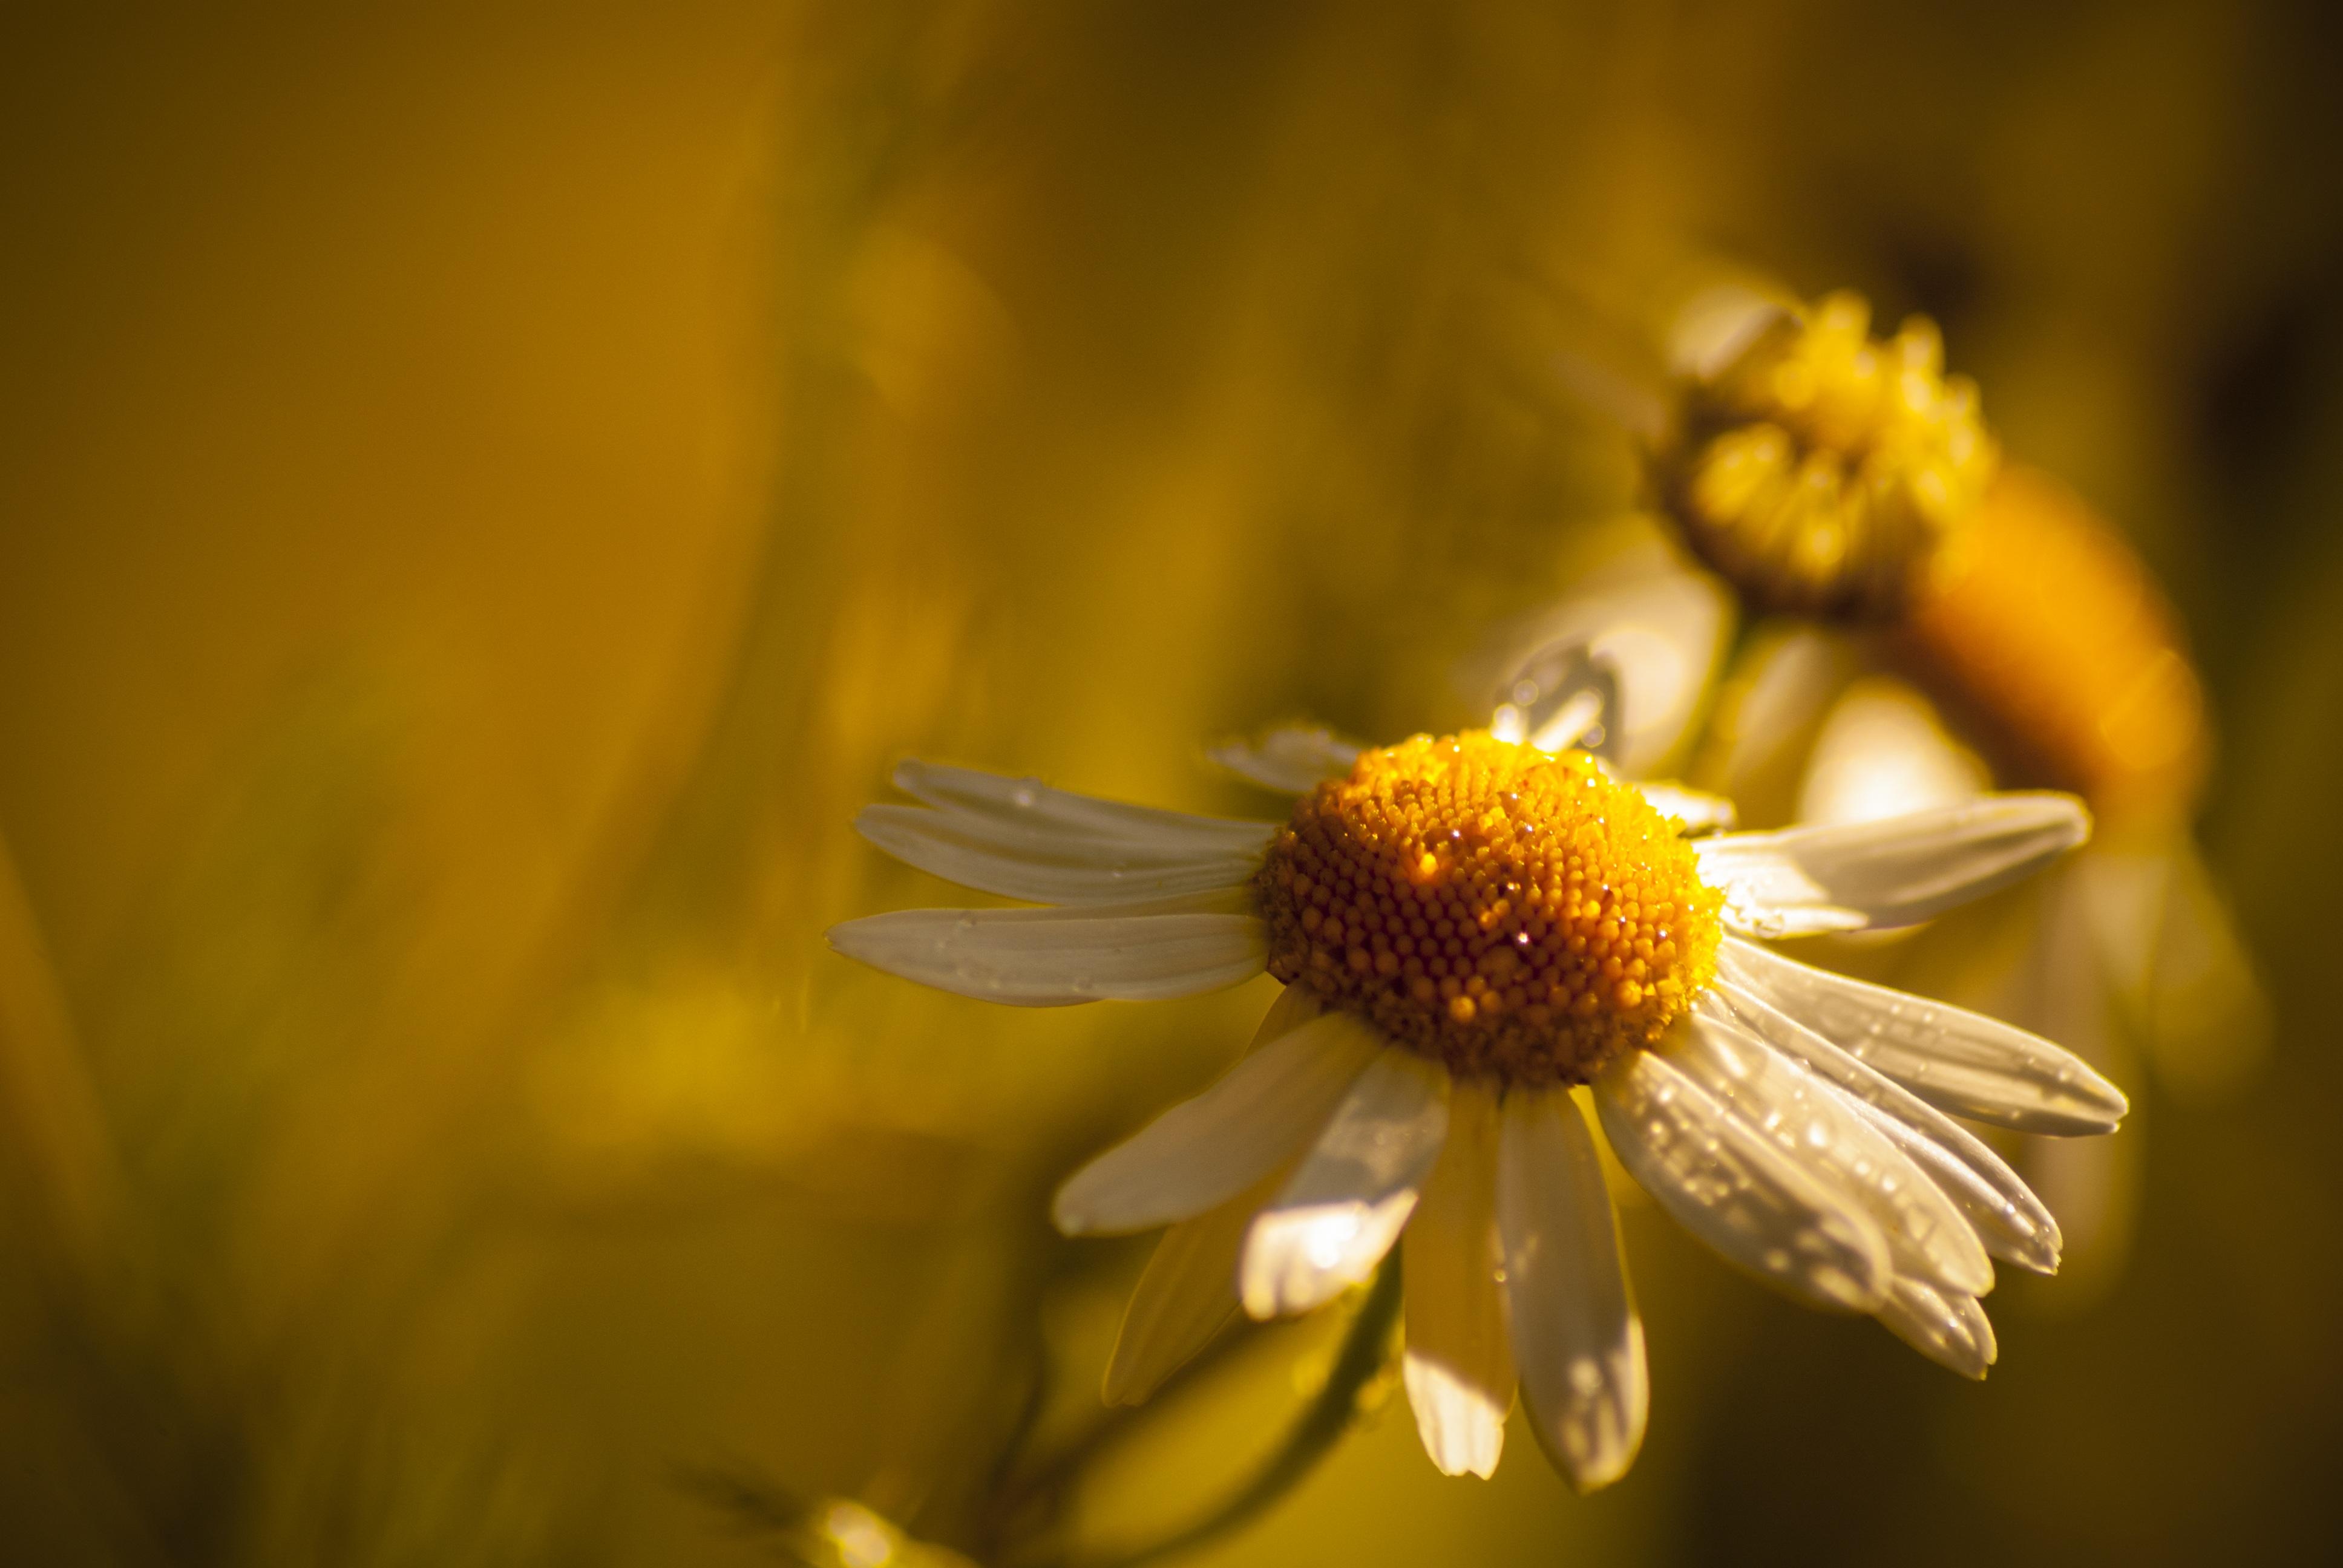 Free Images Nature Blossom Light Bokeh Field Sunlight Leaf